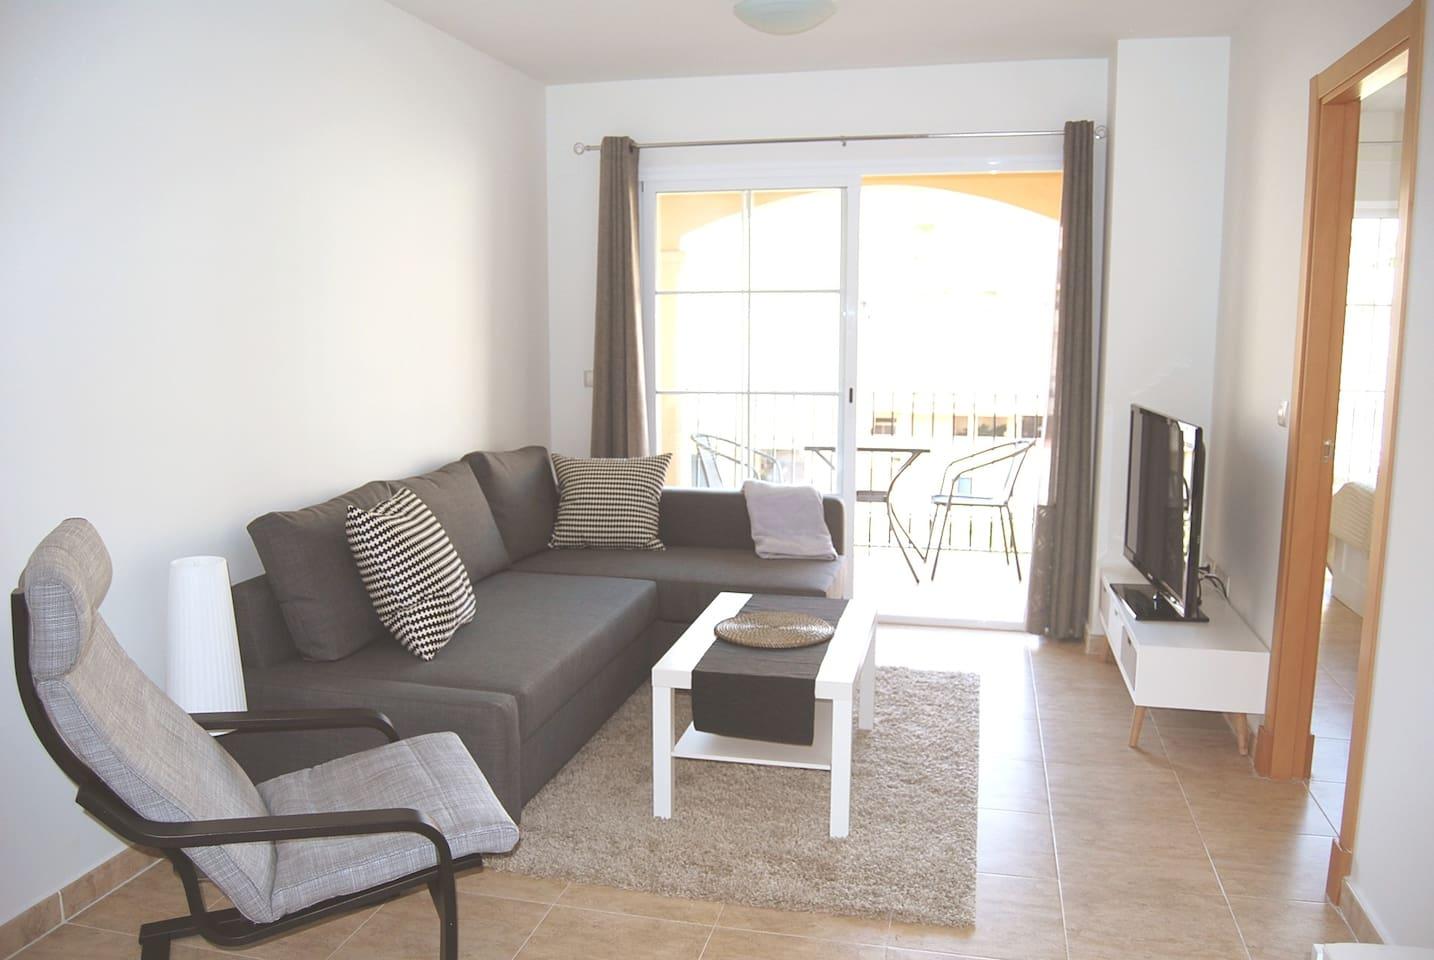 Livingroom and double bedsofa.